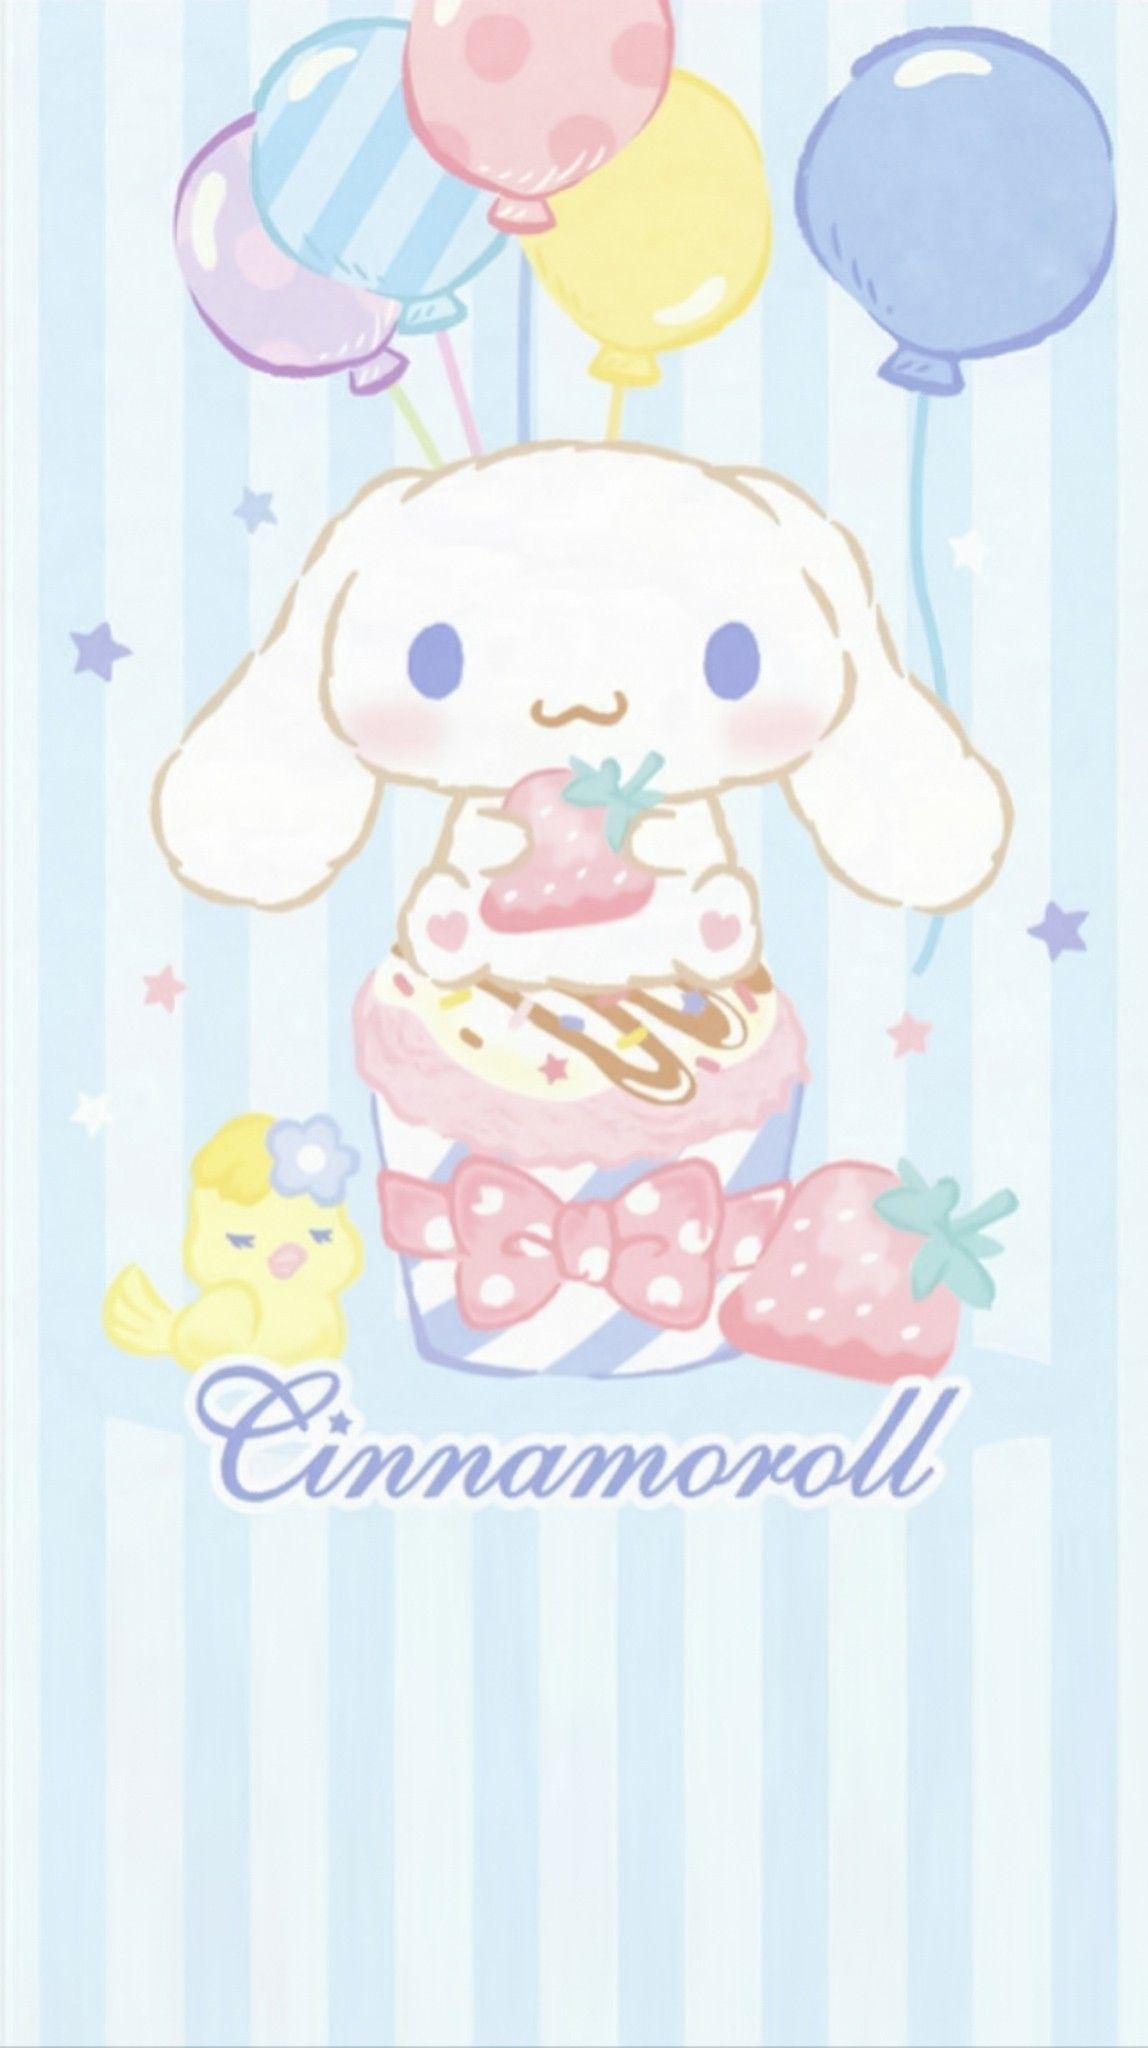 Cinnamoroll Bg おしゃれまとめの人気アイデア Pinterest Aekkalisa 2020 シナモロール 壁紙 壁紙 シナモロール